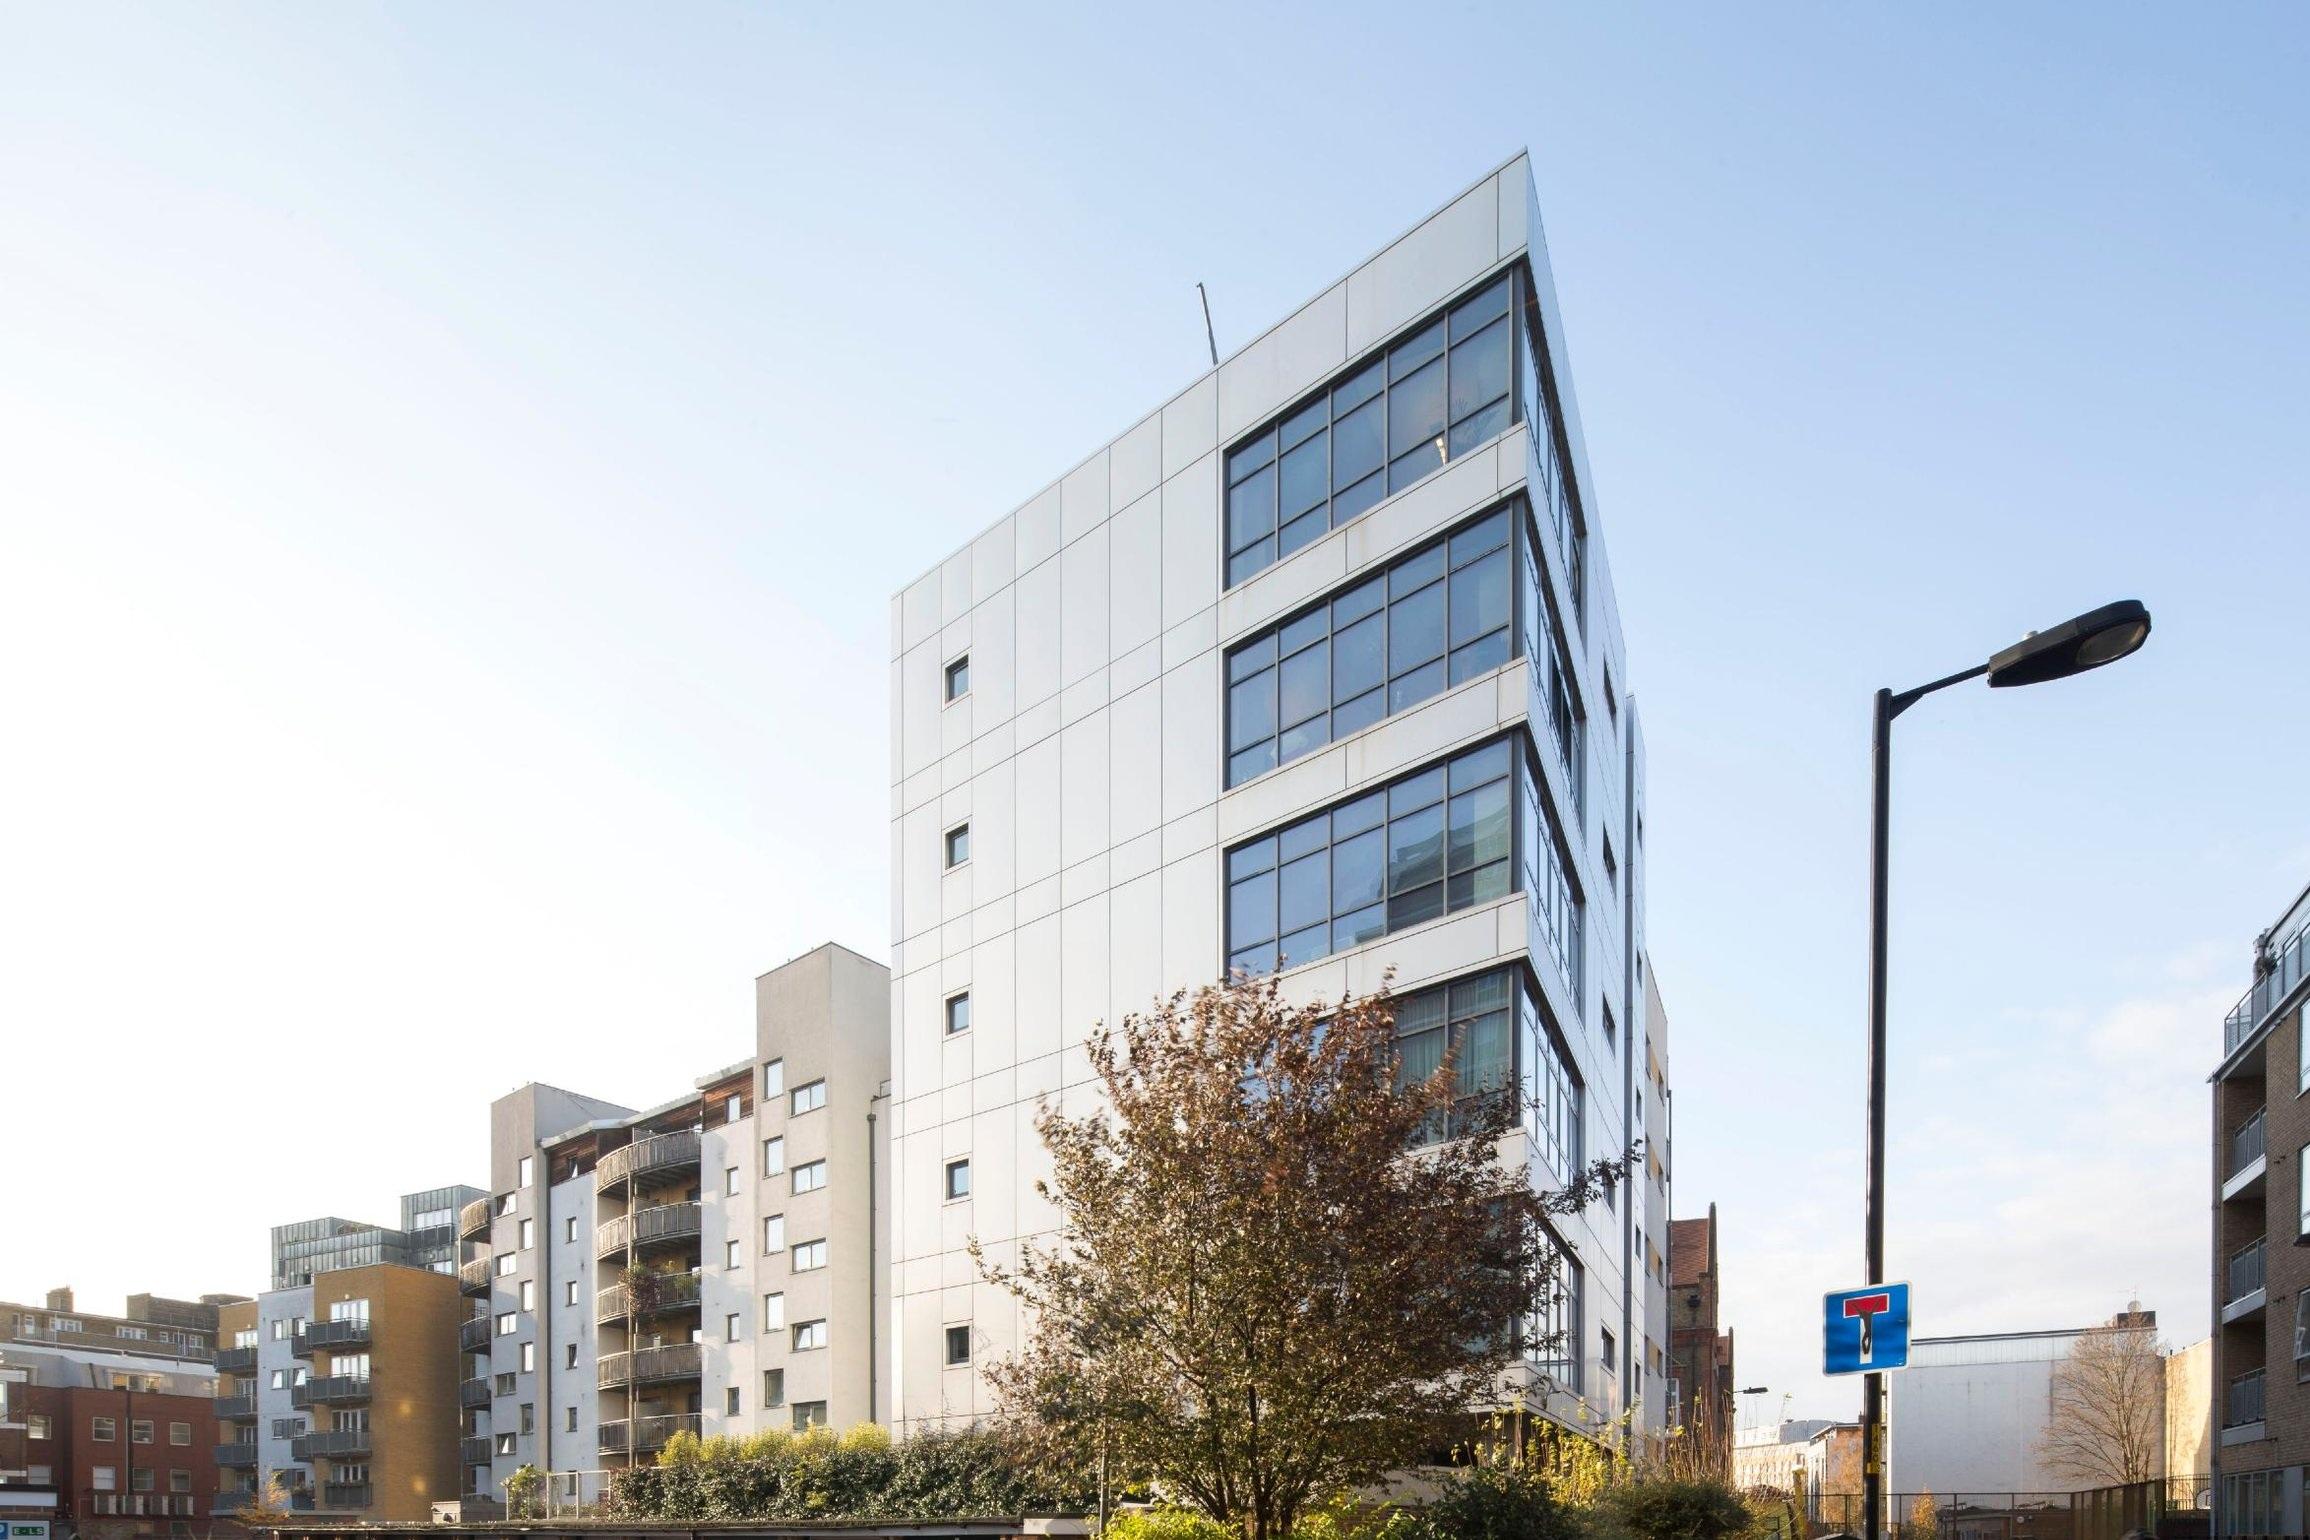 Forge+Architects%2C+Lant+Street+2.jpg